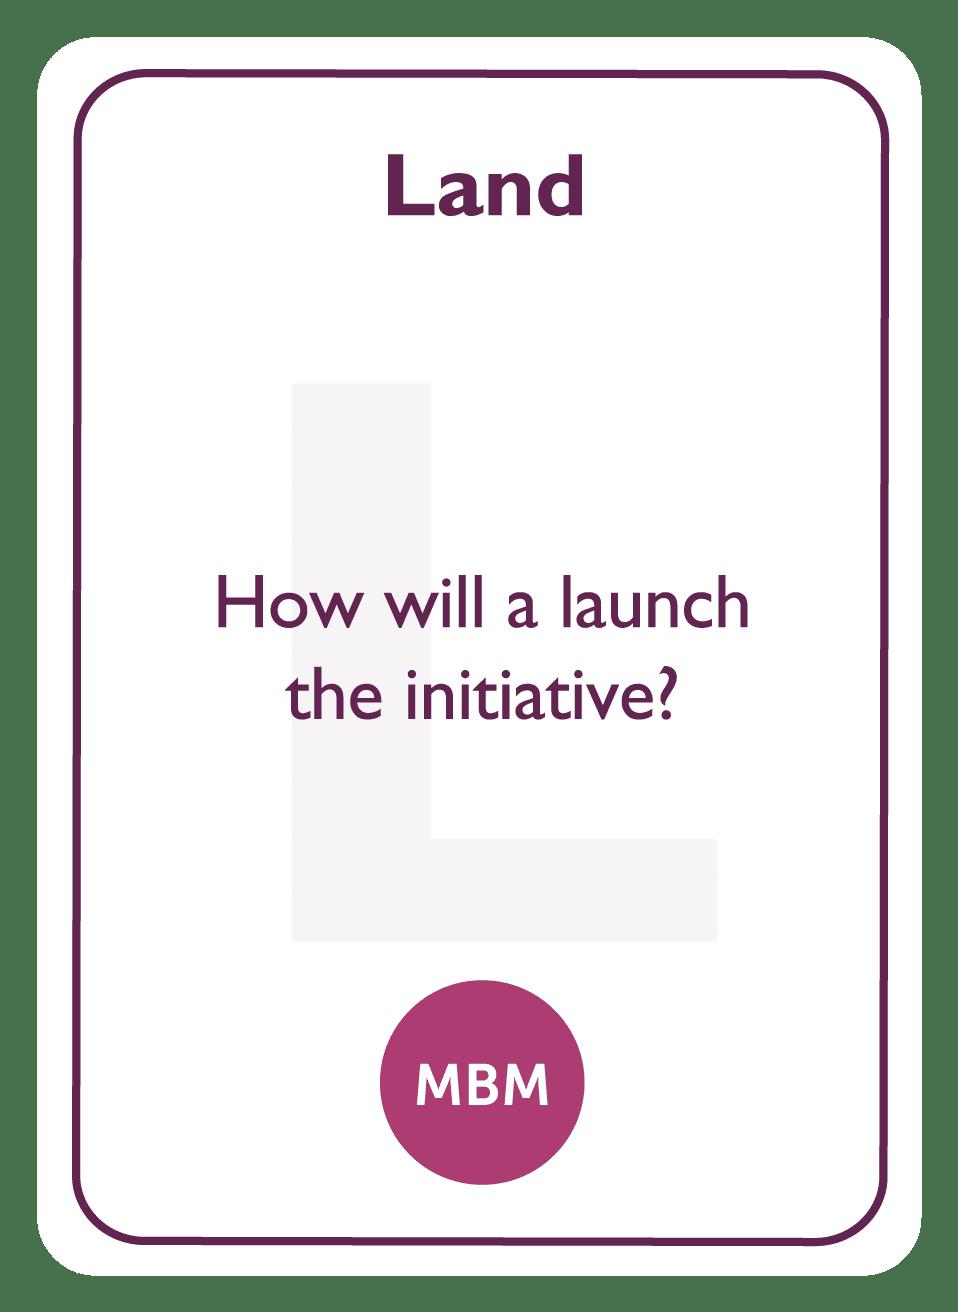 Negotiation coaching card titled Land